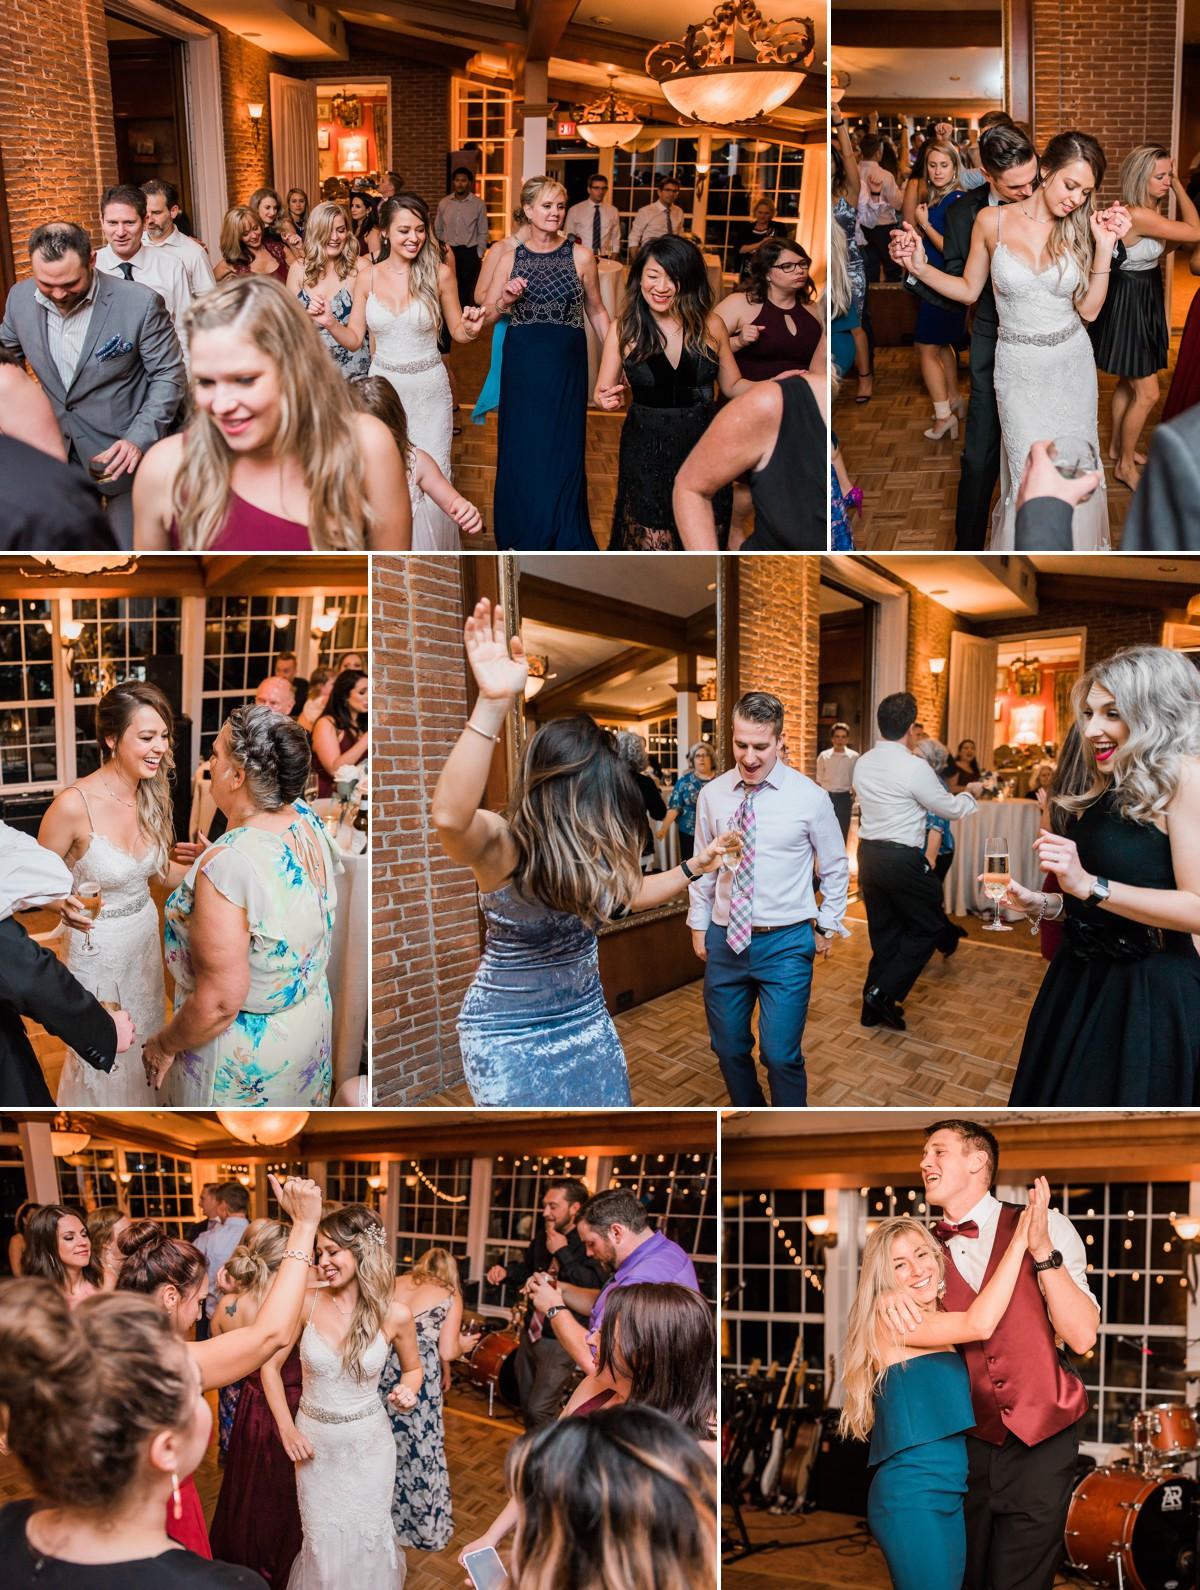 Joan-Brad Houstonian Hotel Wedding Dance Photo by Nate Messarra